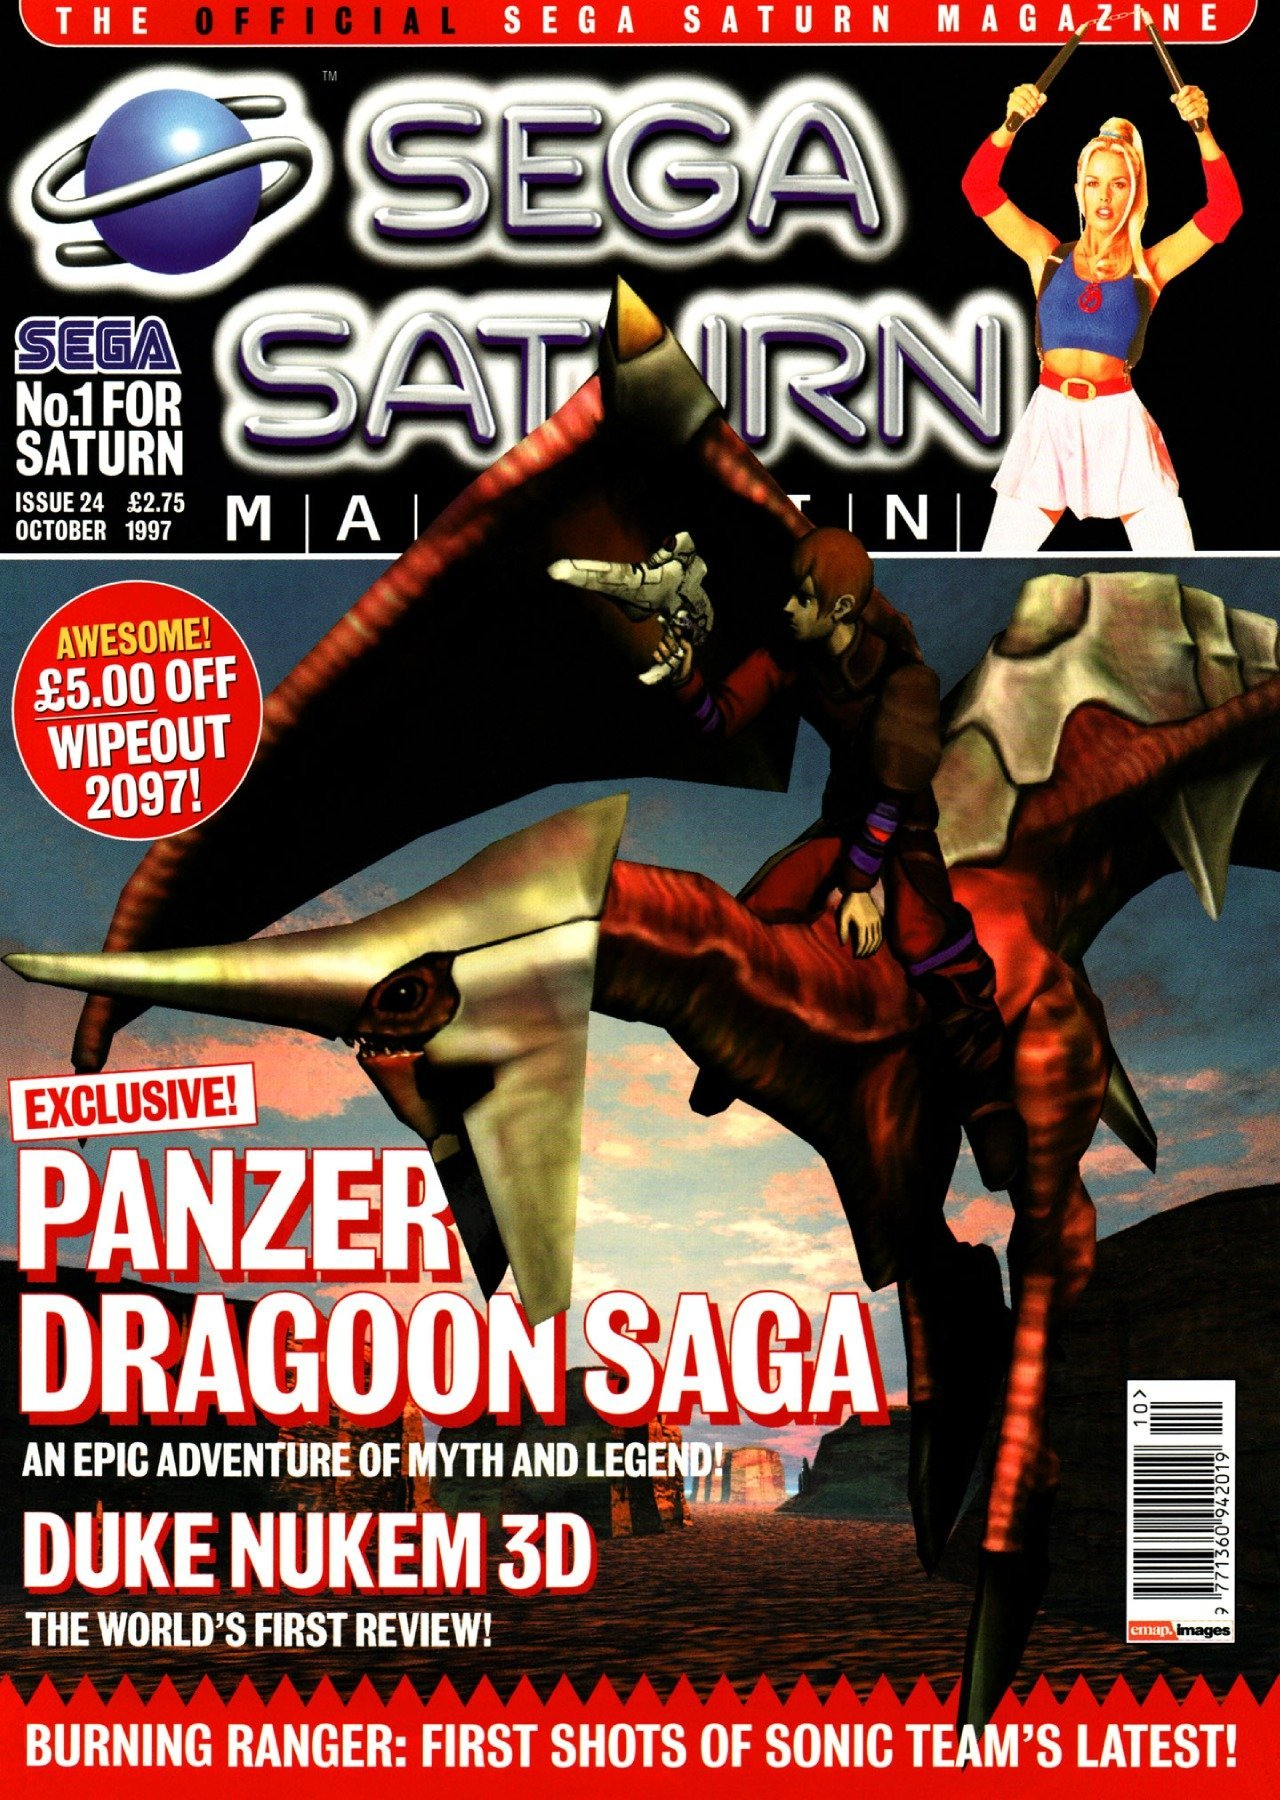 Official Sega Saturn Magazine 24 (October 1997)